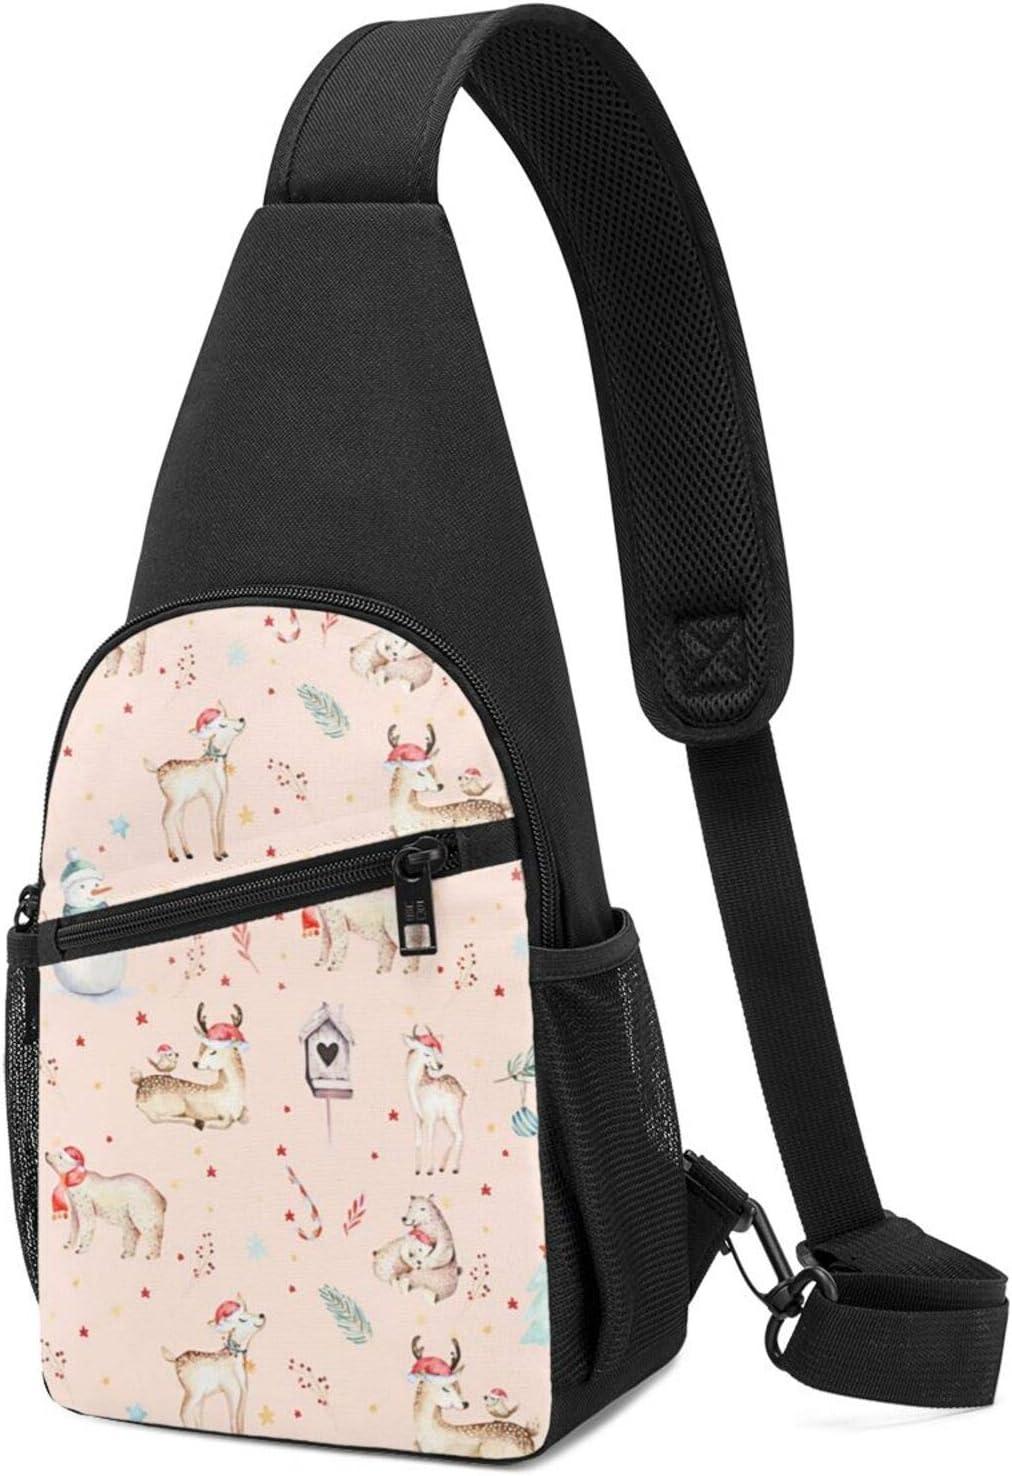 Excellent BMAZI Chest Shoulder Backpack Christmas Snow Men SALENEW very popular! Watercolor Deer